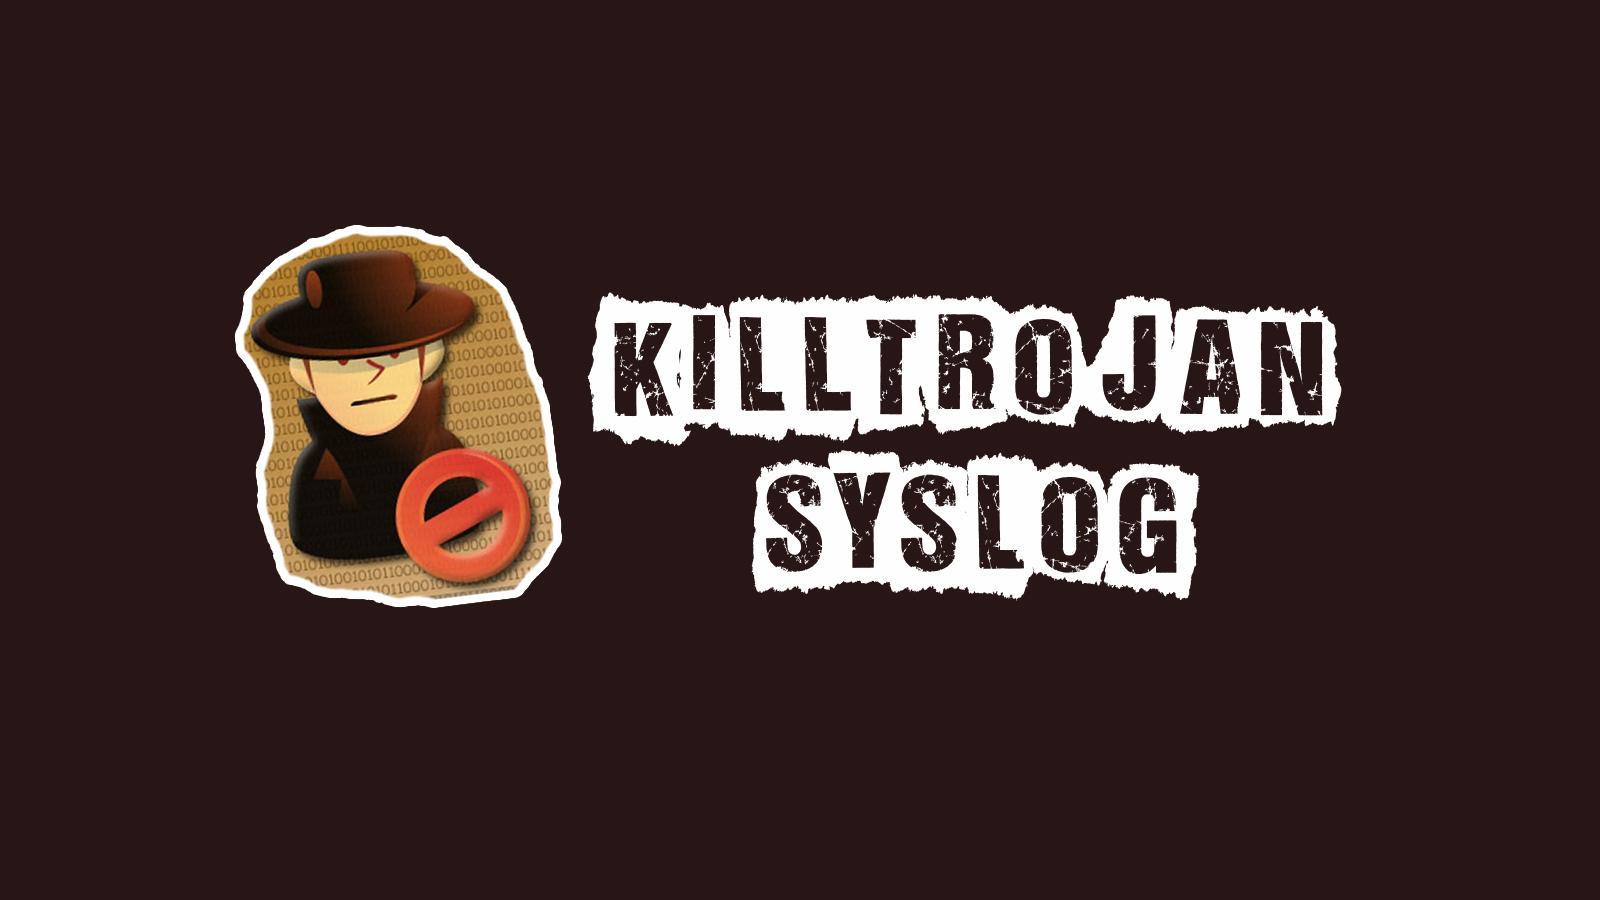 Killtrojan Syslog - Tool To Detect Malware Activity On a System